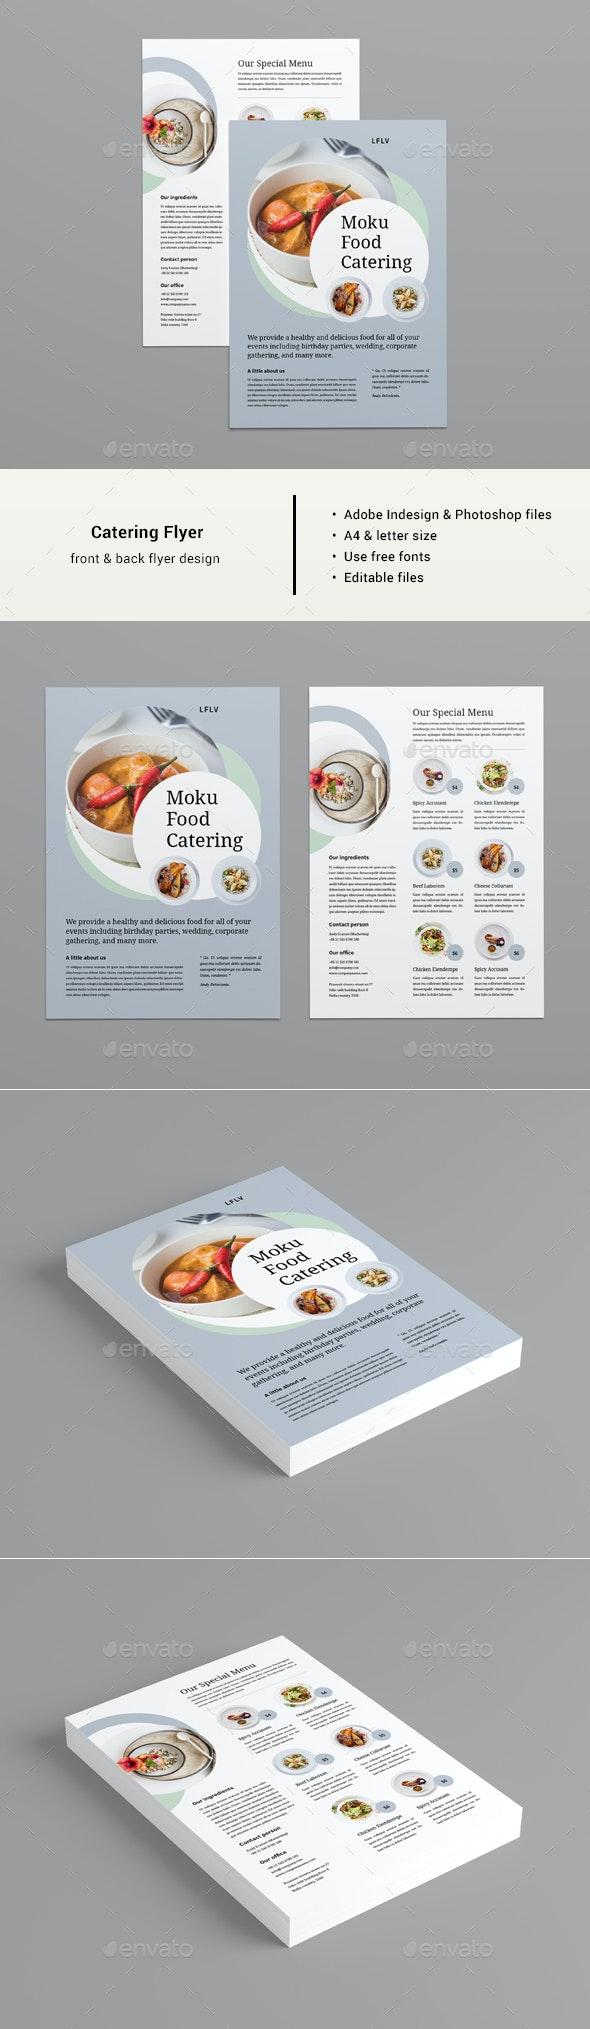 Catering Flyer - Restaurant Flyers